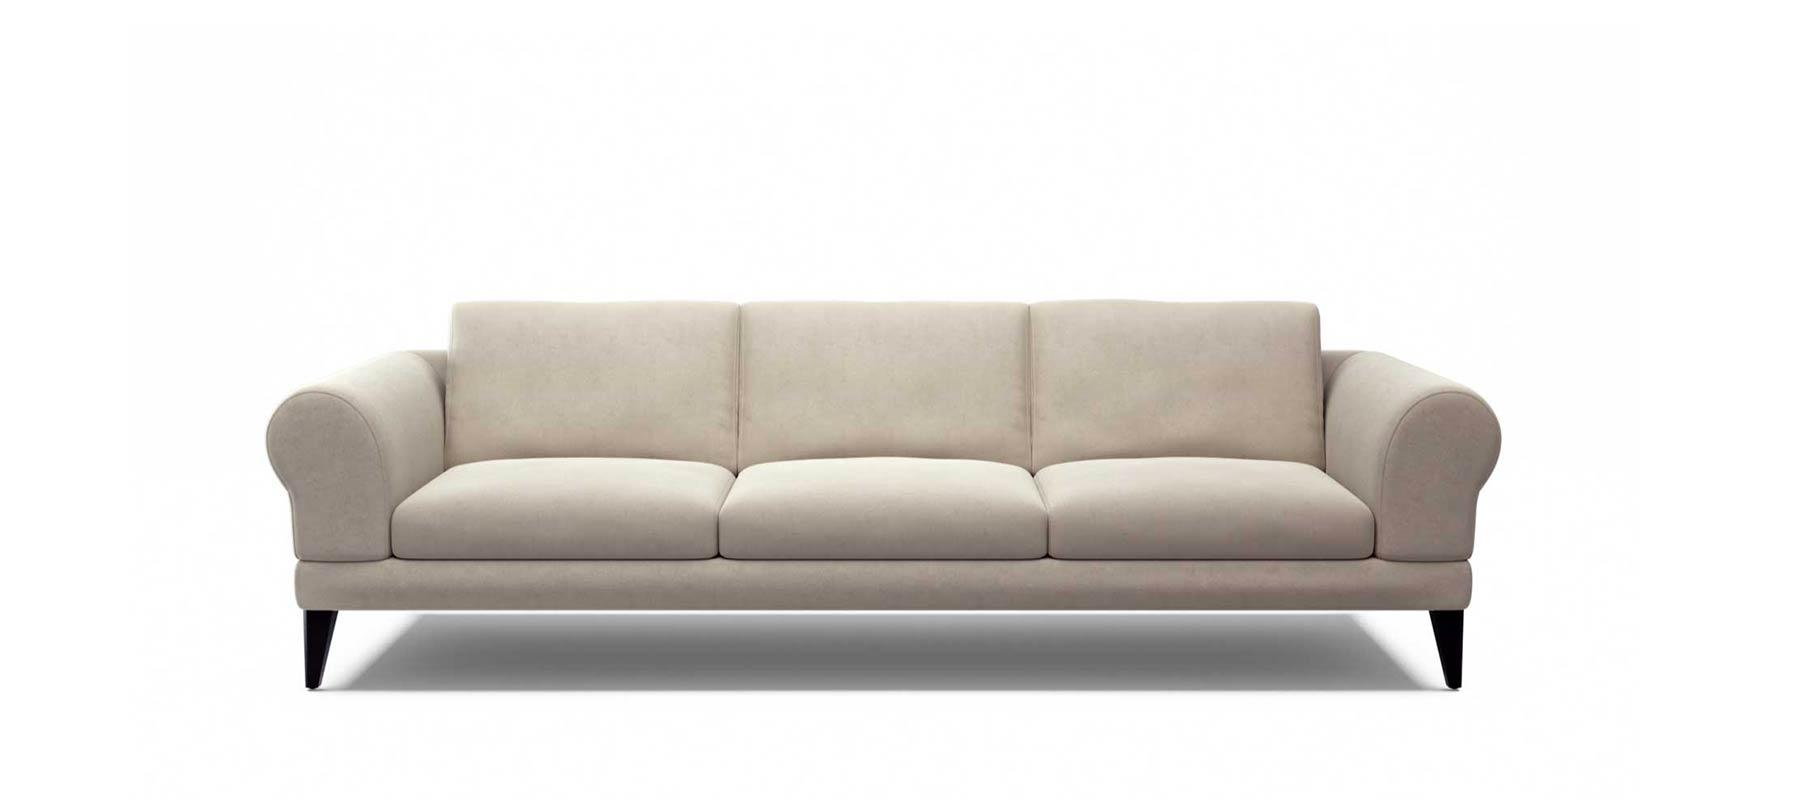 Sonata Sofa Elegant Modular Sofa Design Superior